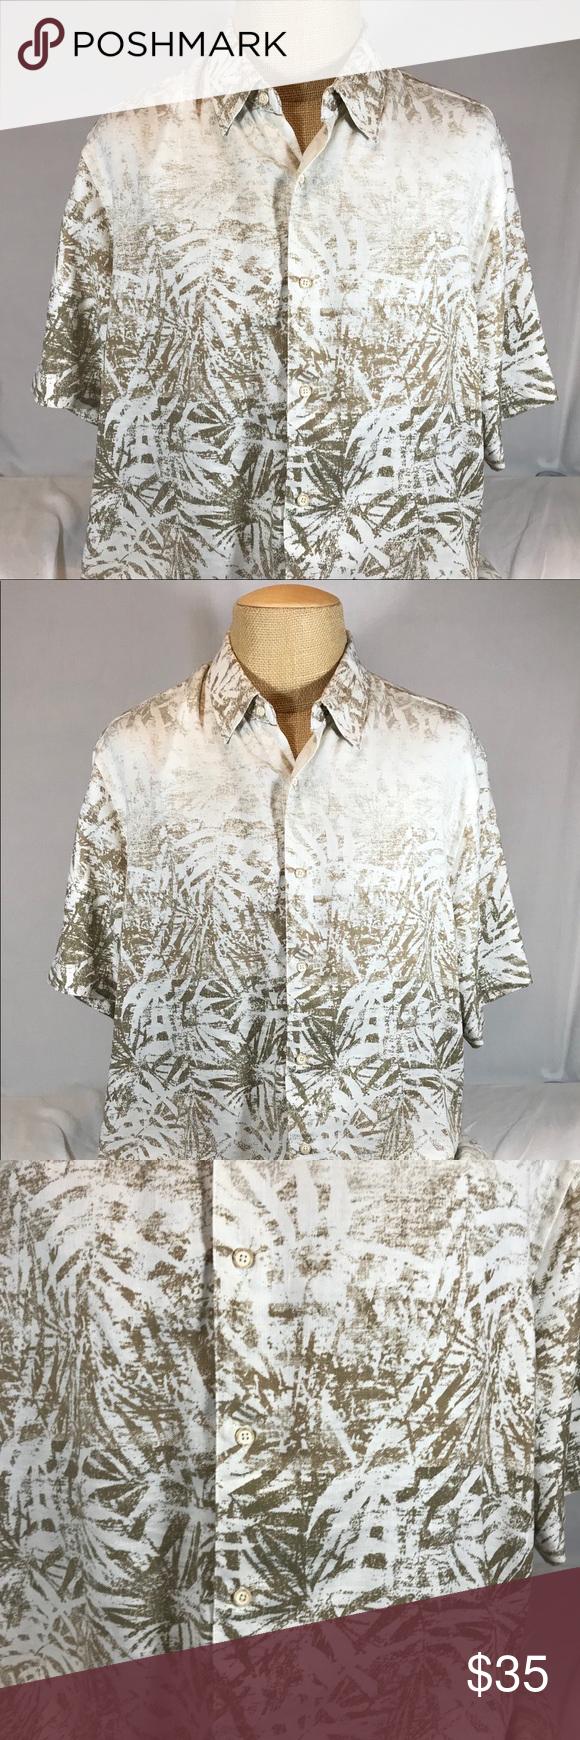 Tasso Elba Island Silk & Linen Hawaiian Shirt Tasso Elba